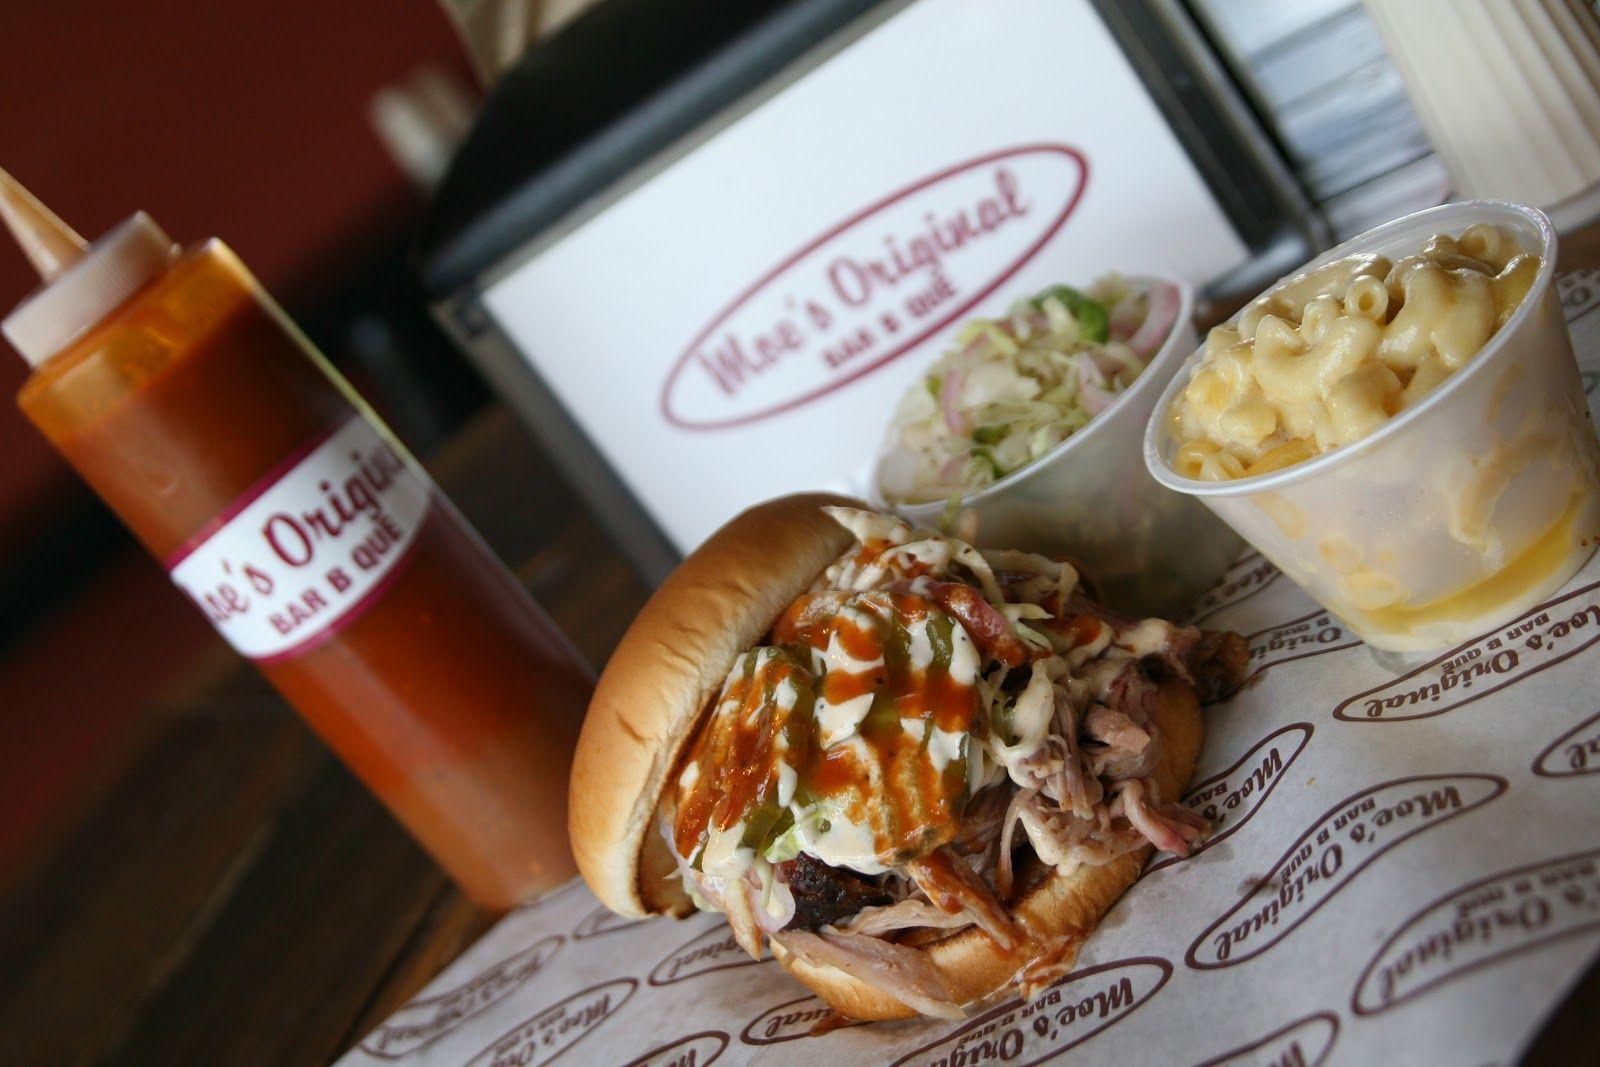 Restaurant Review Moe's Original BarBQue Marinated